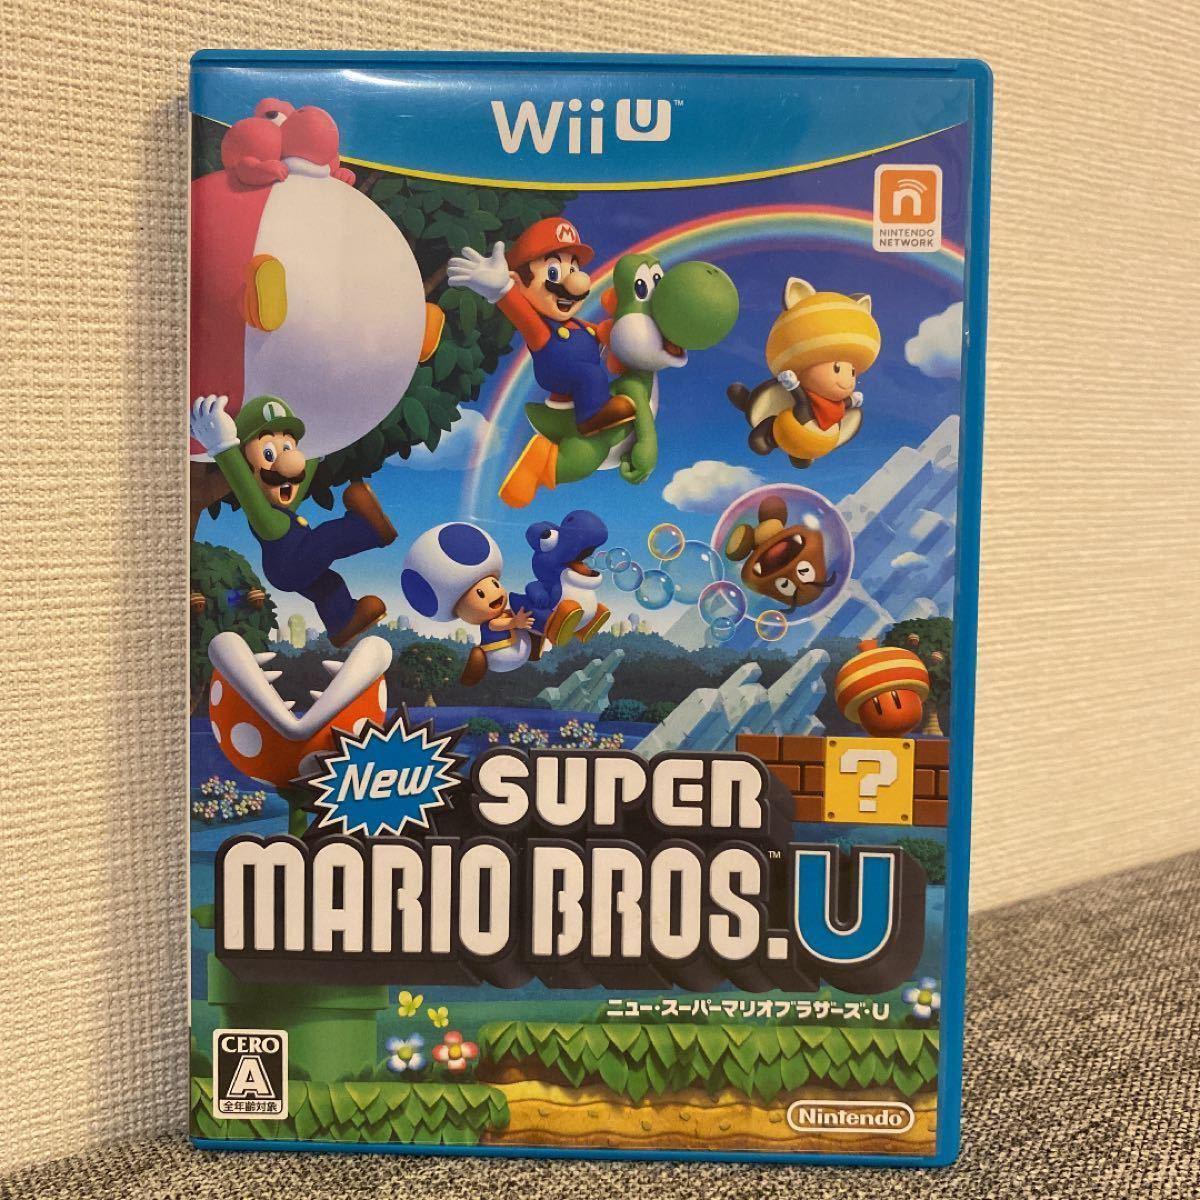 WiiUソフト マリオカート8、New スーパーマリオブラザーズ・U 2本セット 任天堂